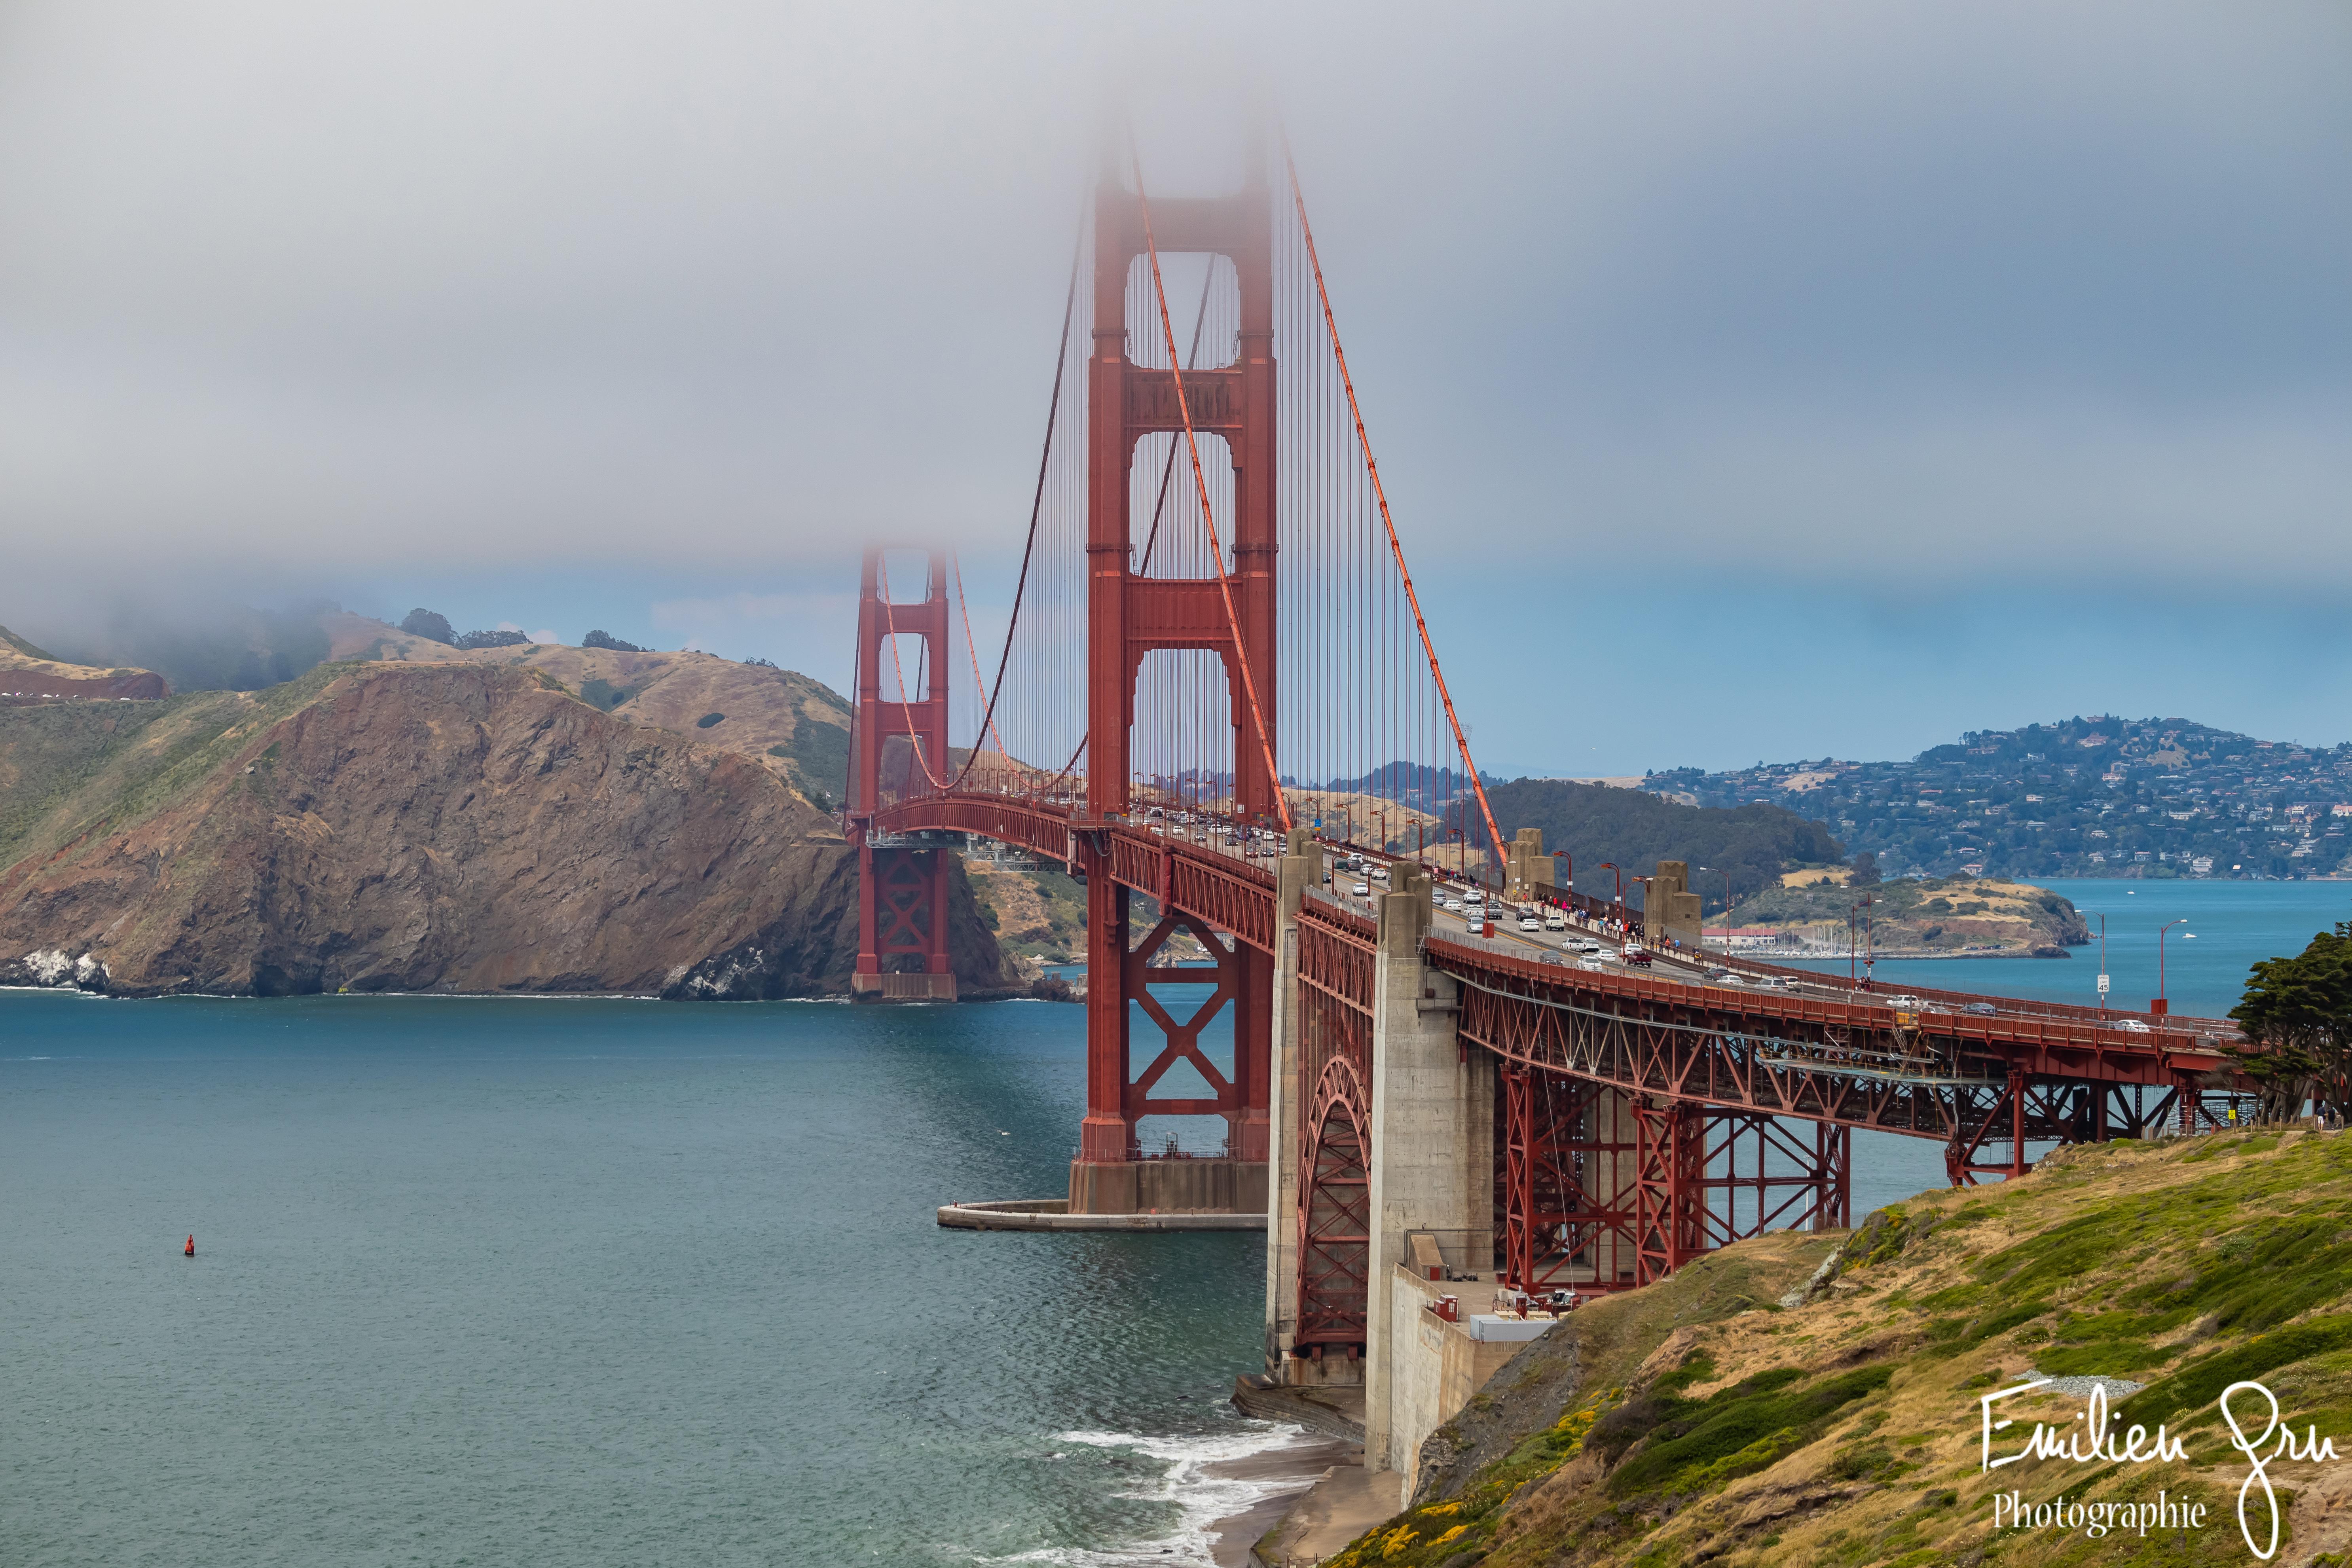 Golden Gate - Emilien Grn Photographie